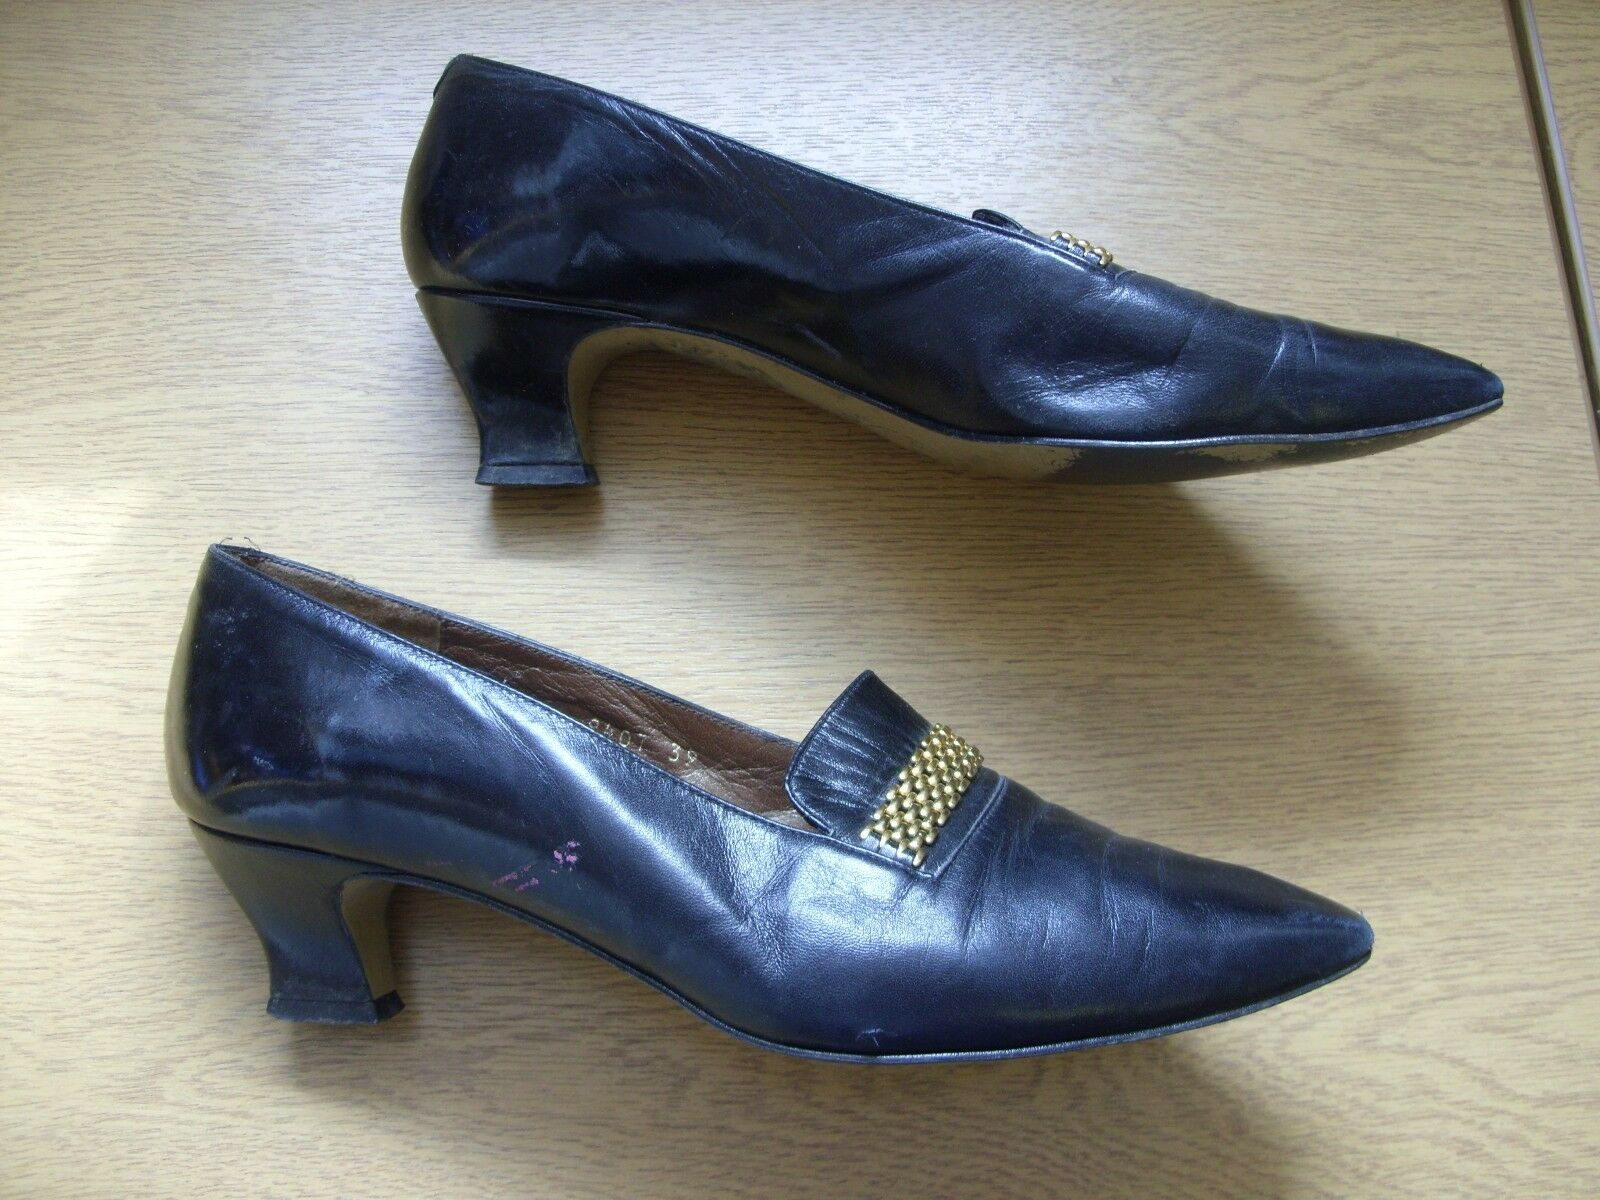 Ladies shoes Rombah Wallace black black black leather courts UK 6 EU 39, handmade, used 3263 468894